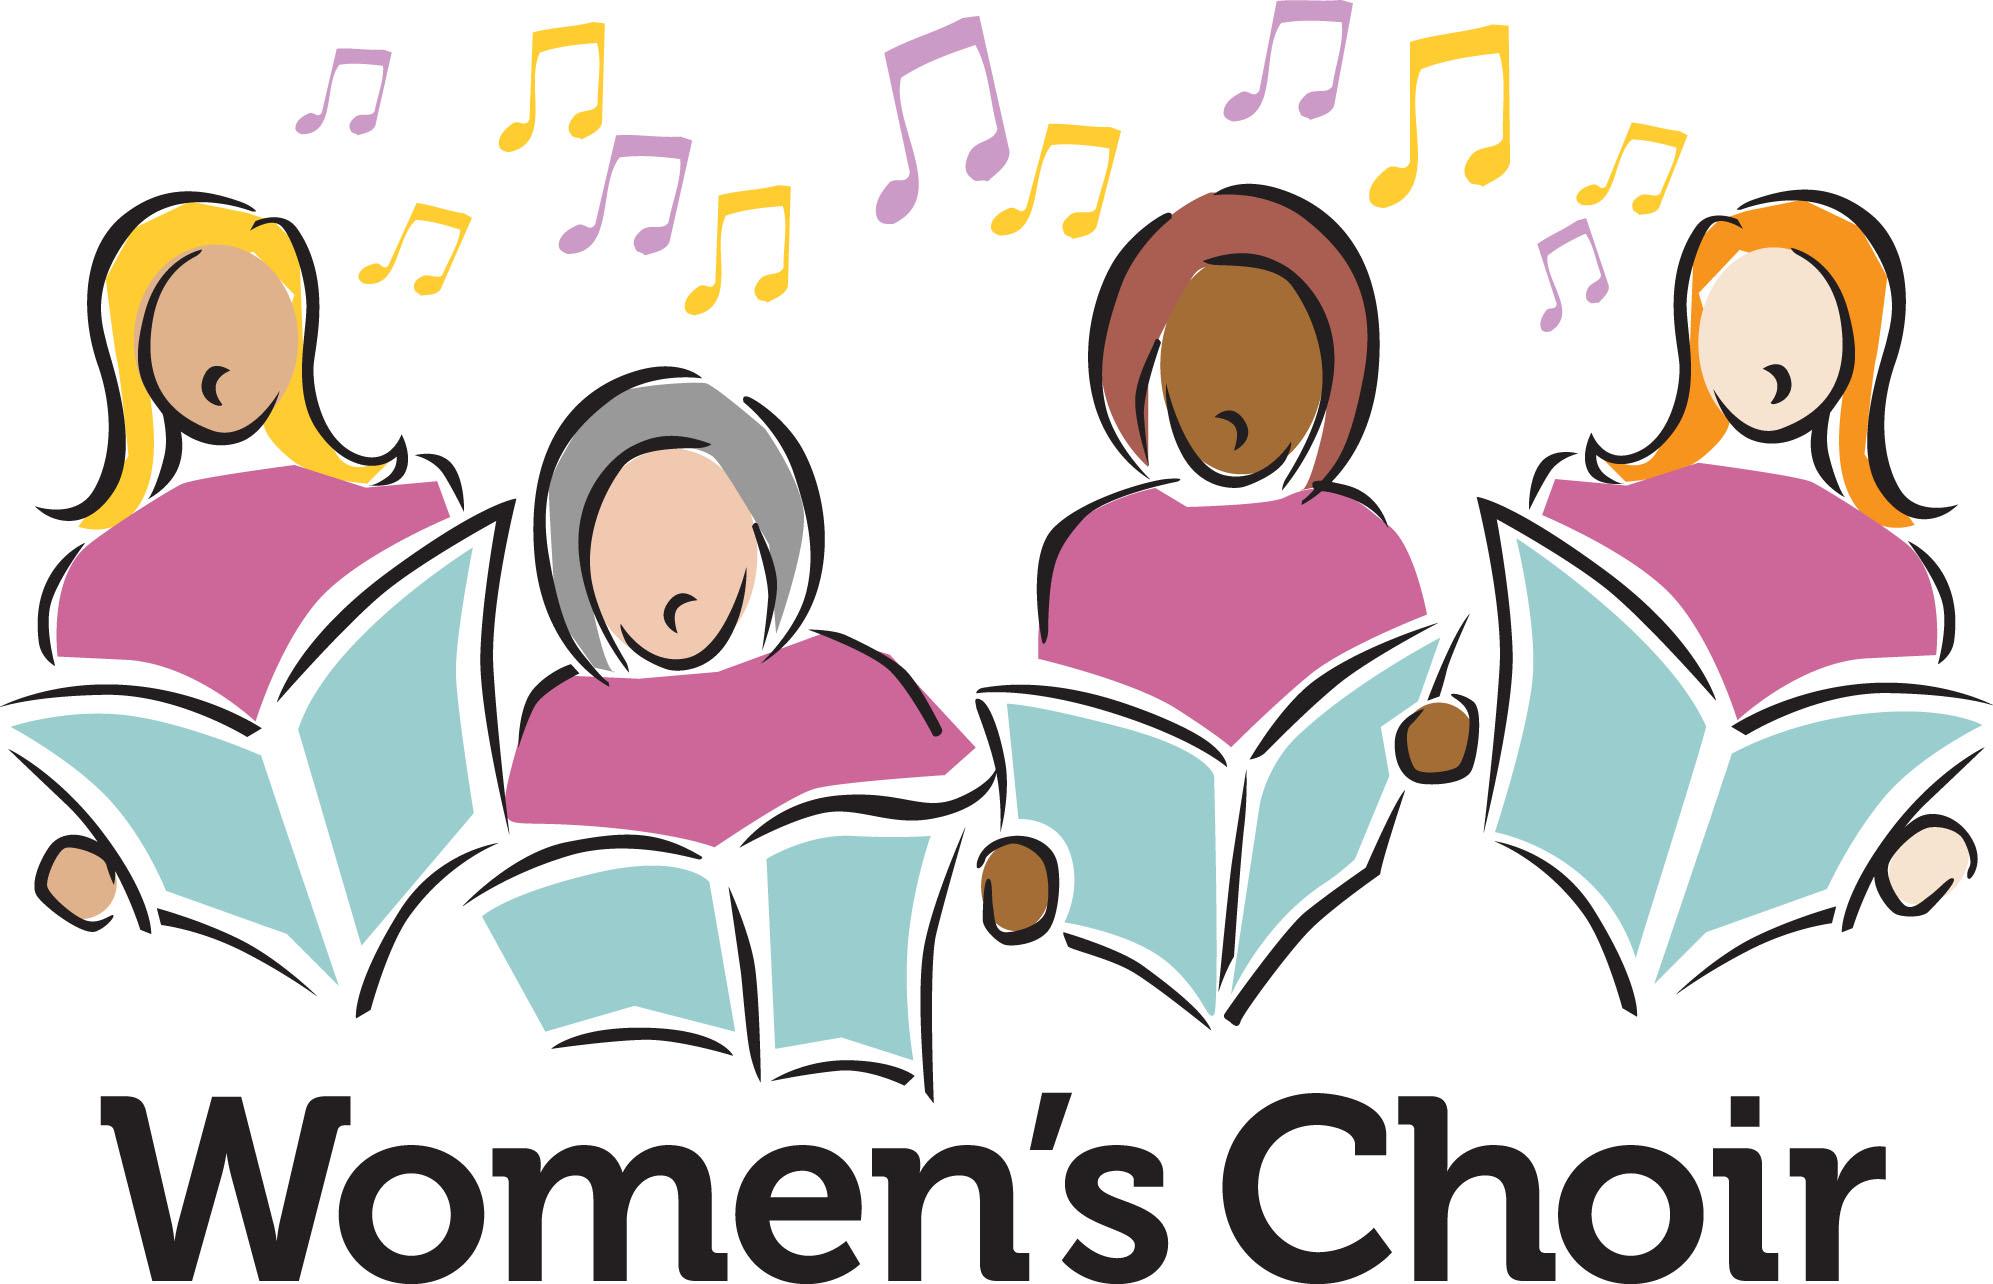 Chorus clipart women's. Choir images free download